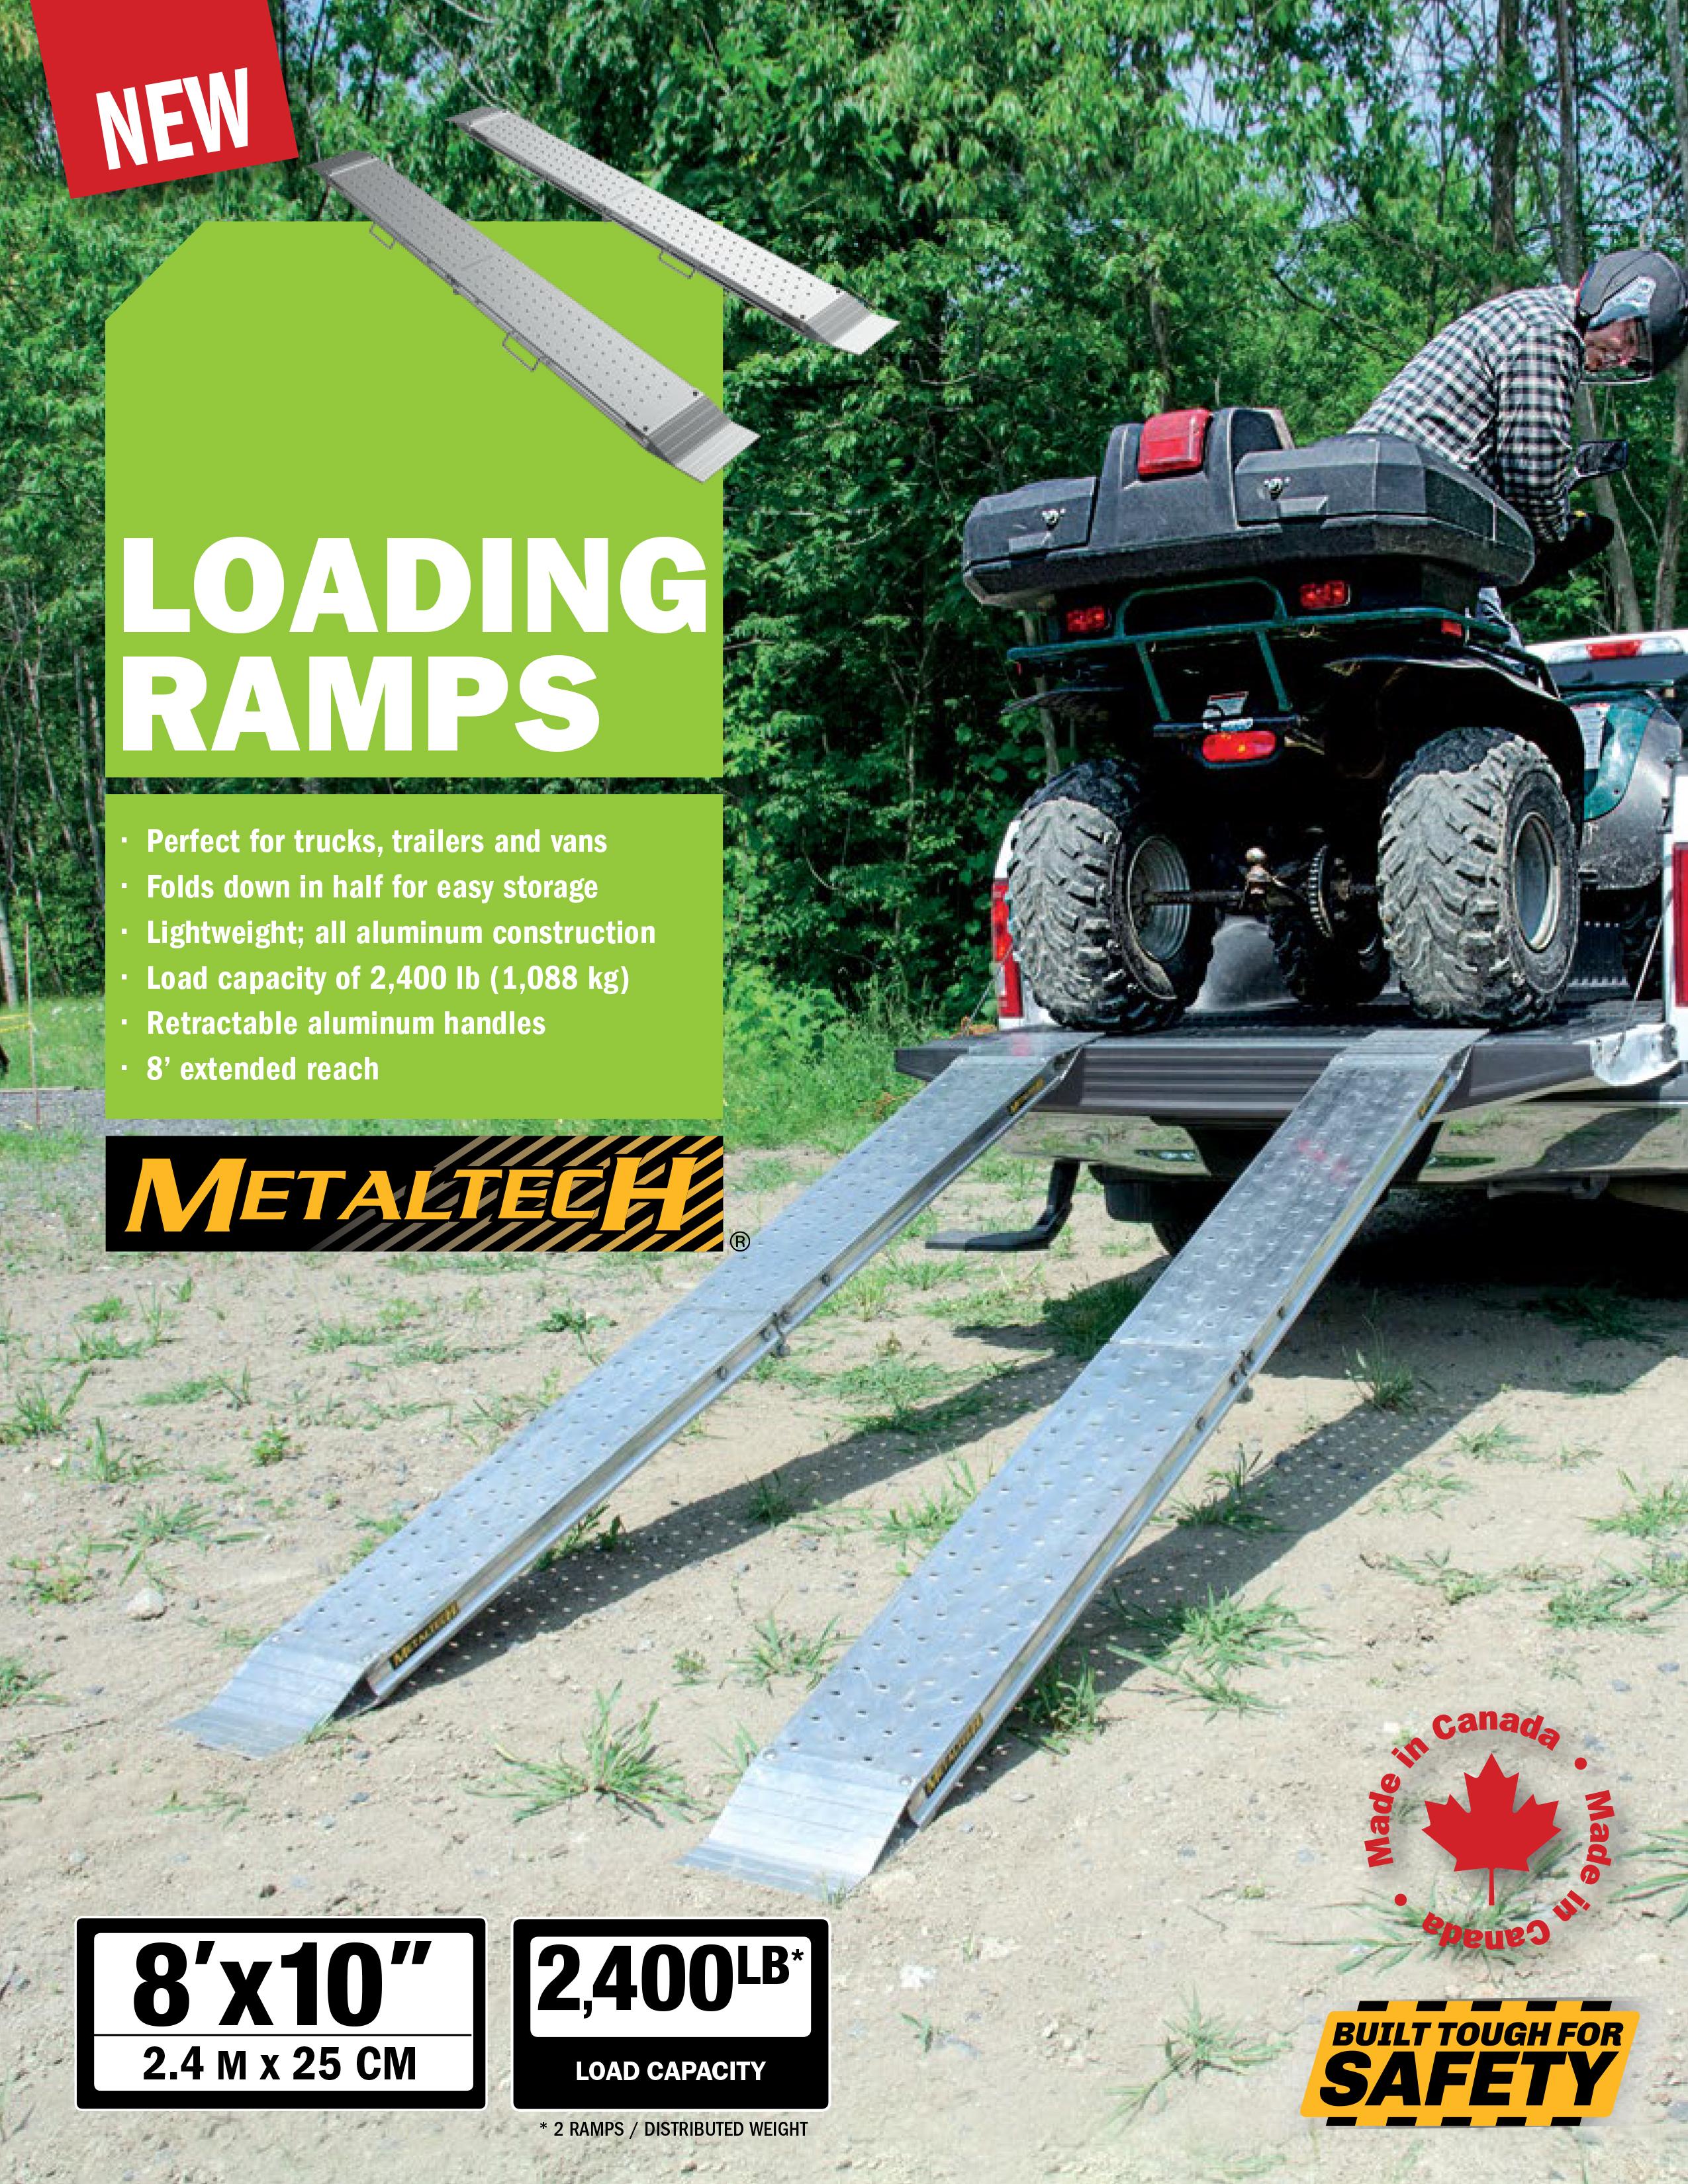 metaltech-loading-ramps-1.jpg